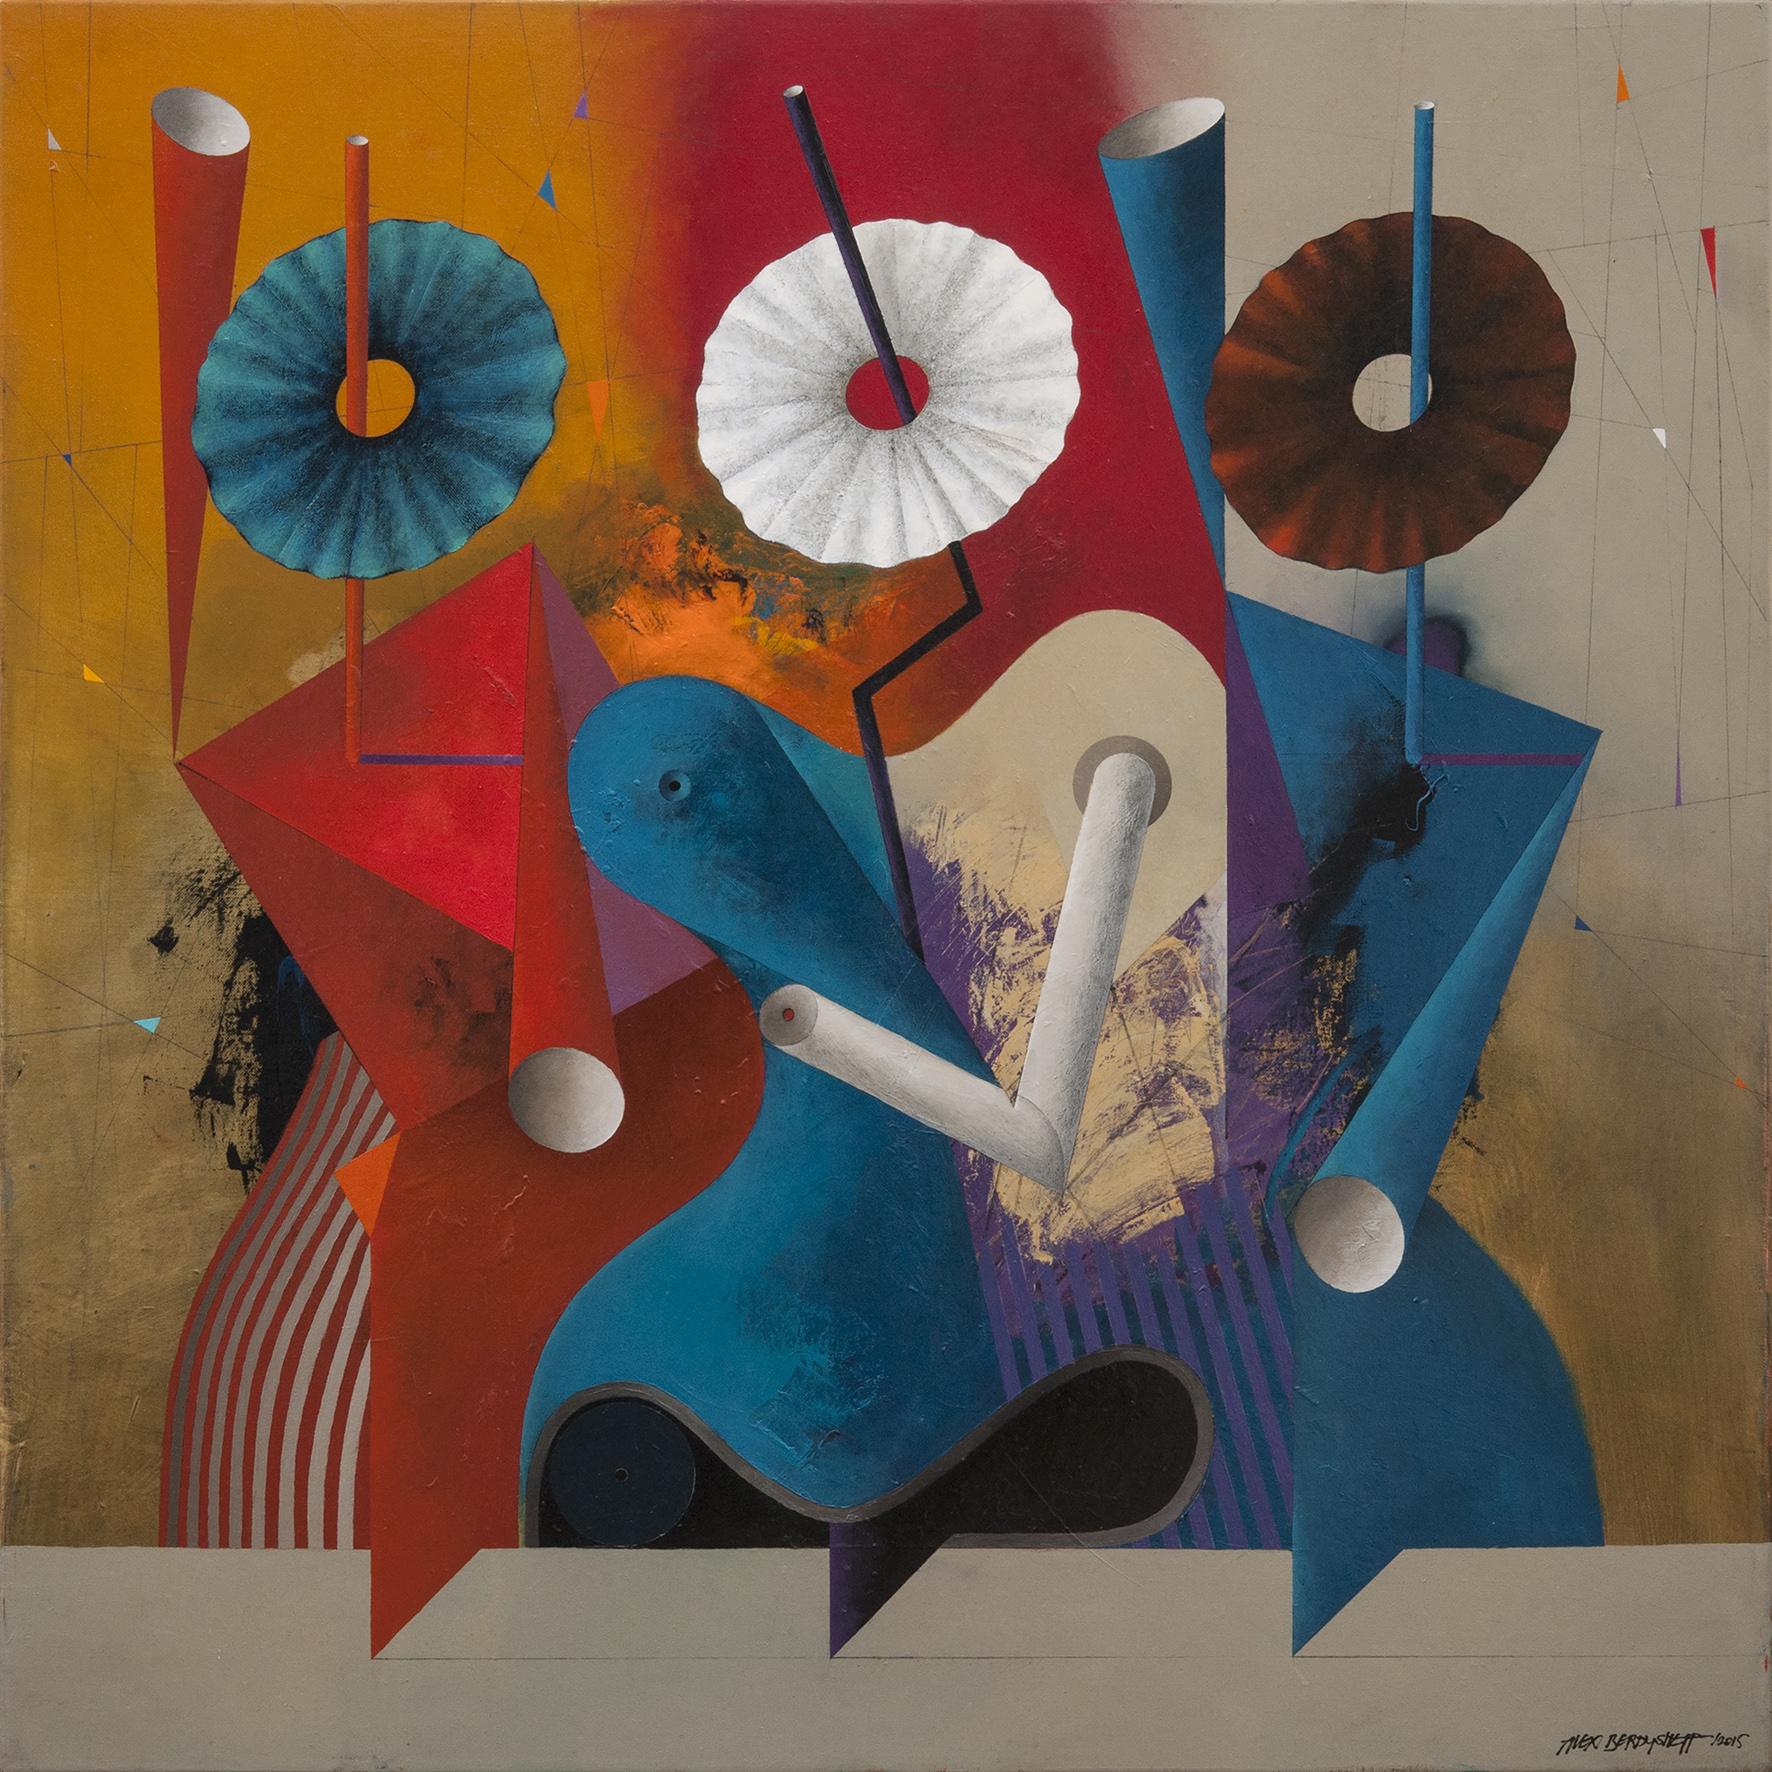 Trio, oil on canvas, 85x85 cm, 2015